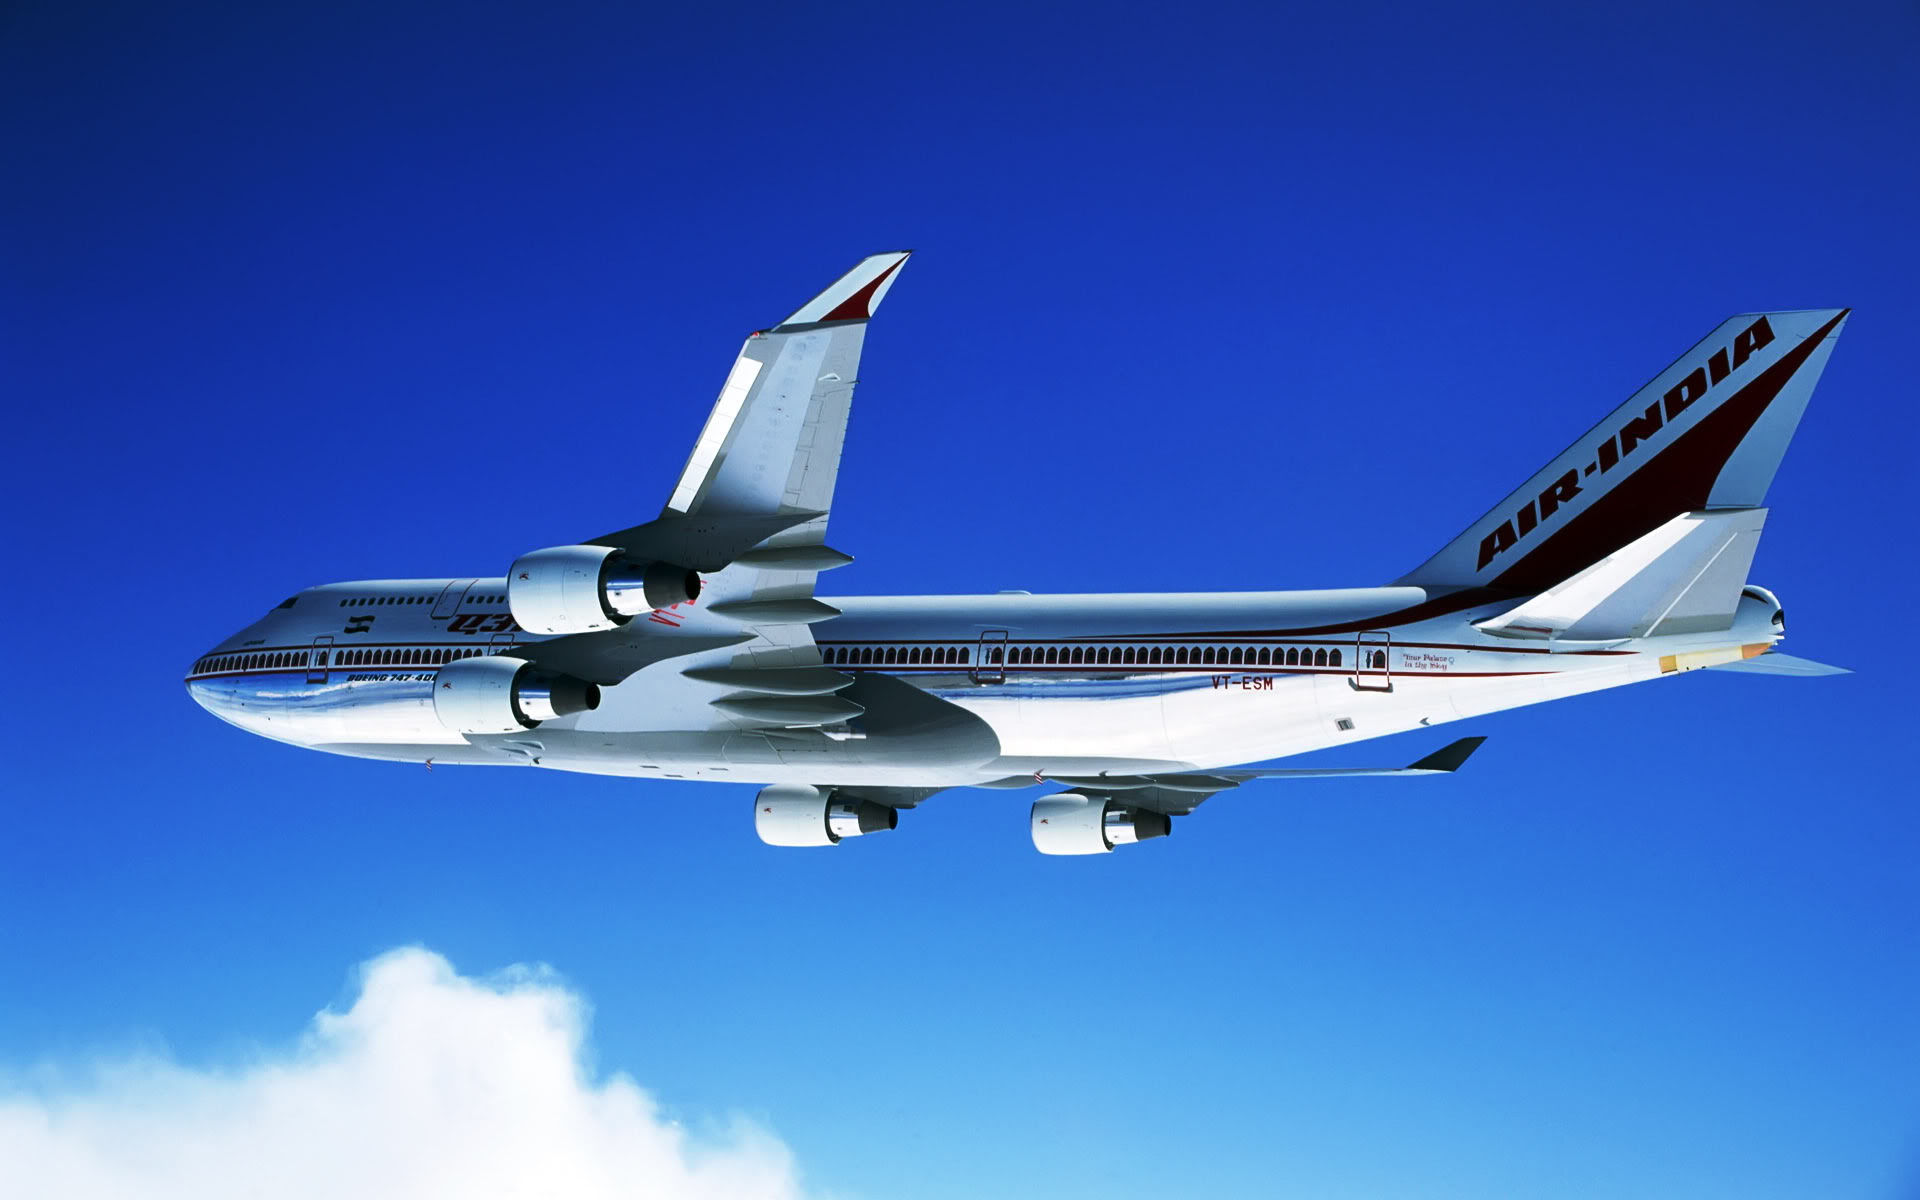 Civil Aircraft 1023